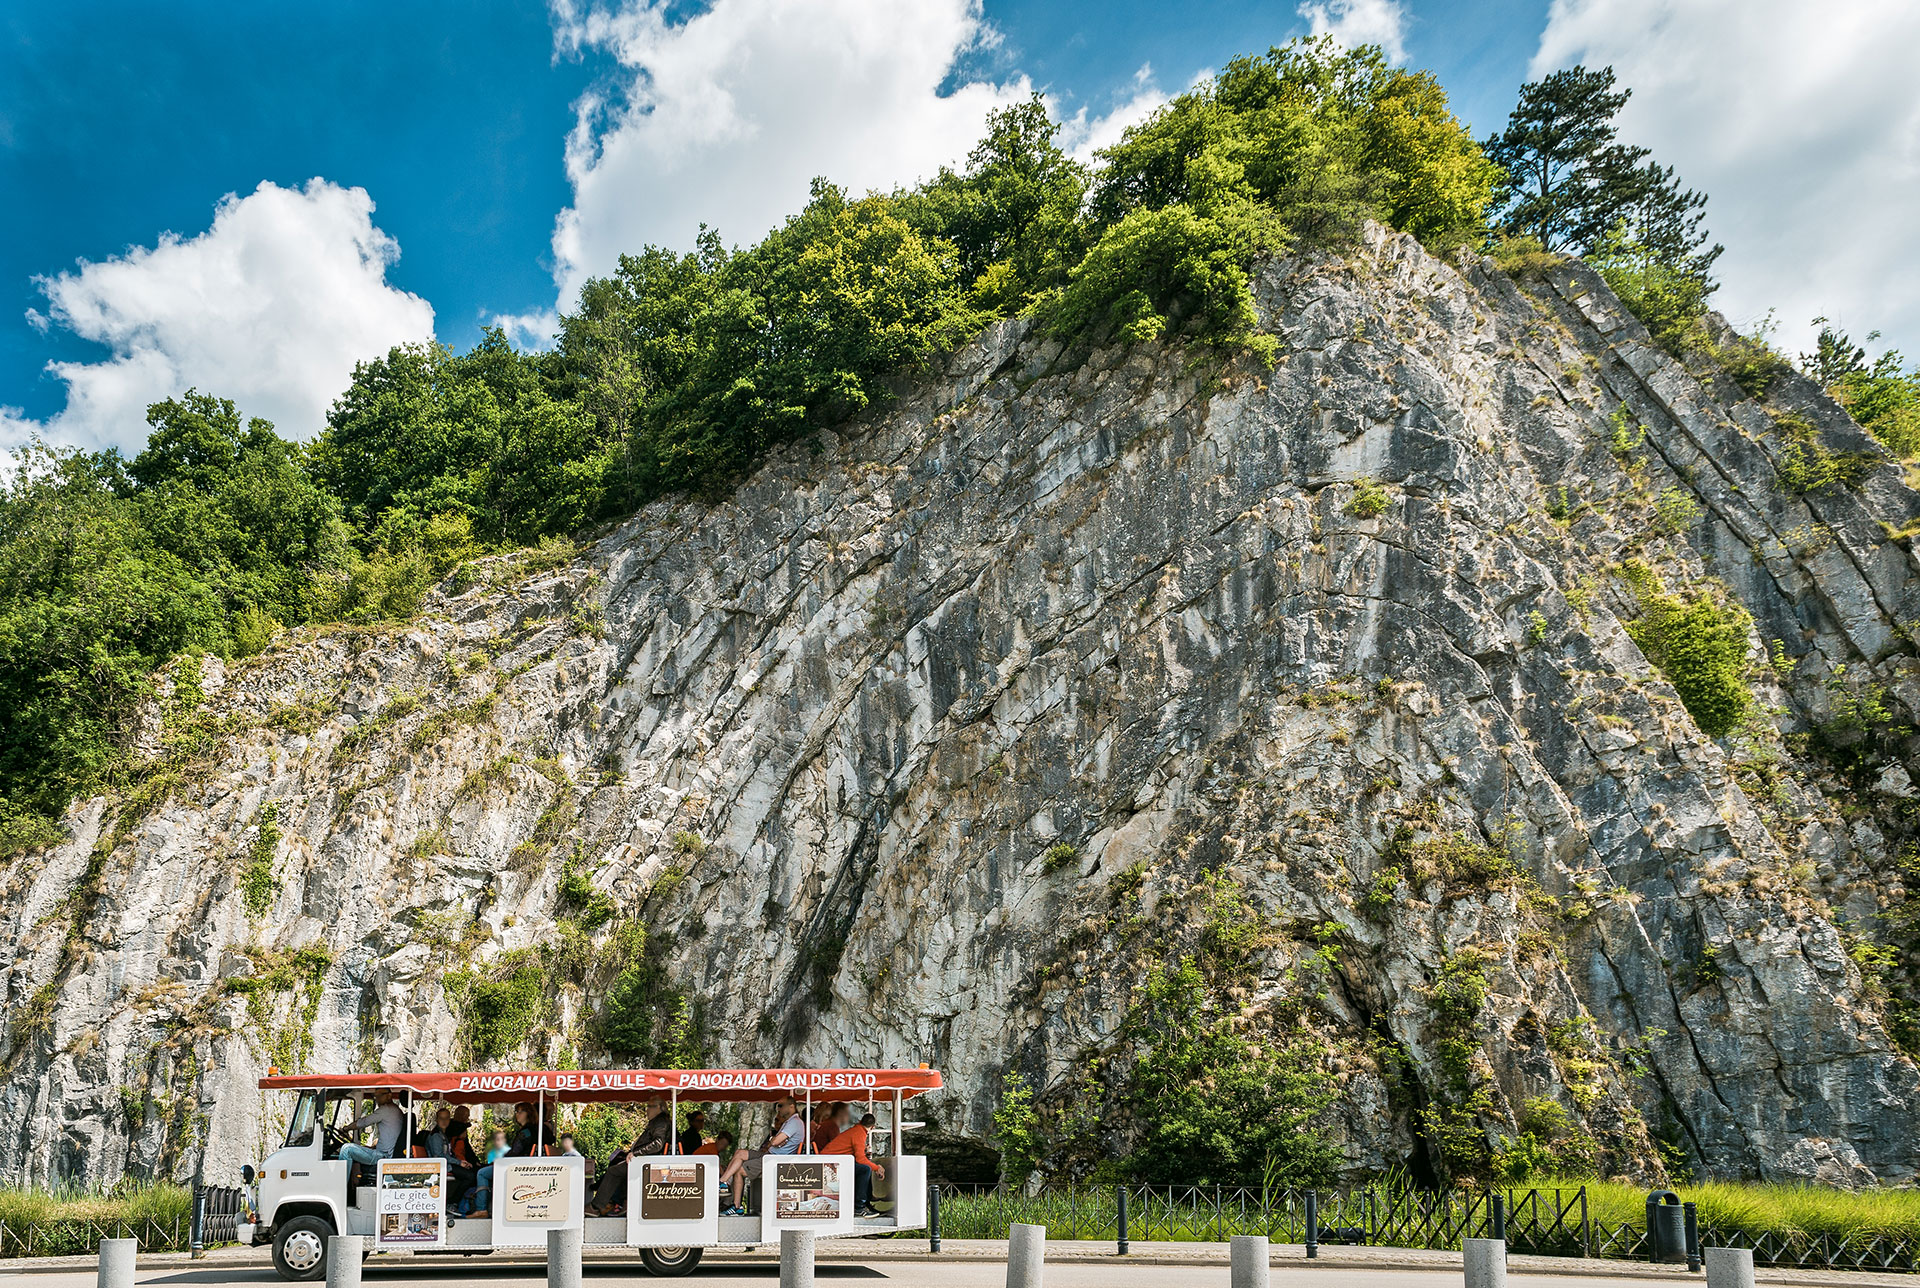 anticline - Petit Train - Touristique - Durbuy